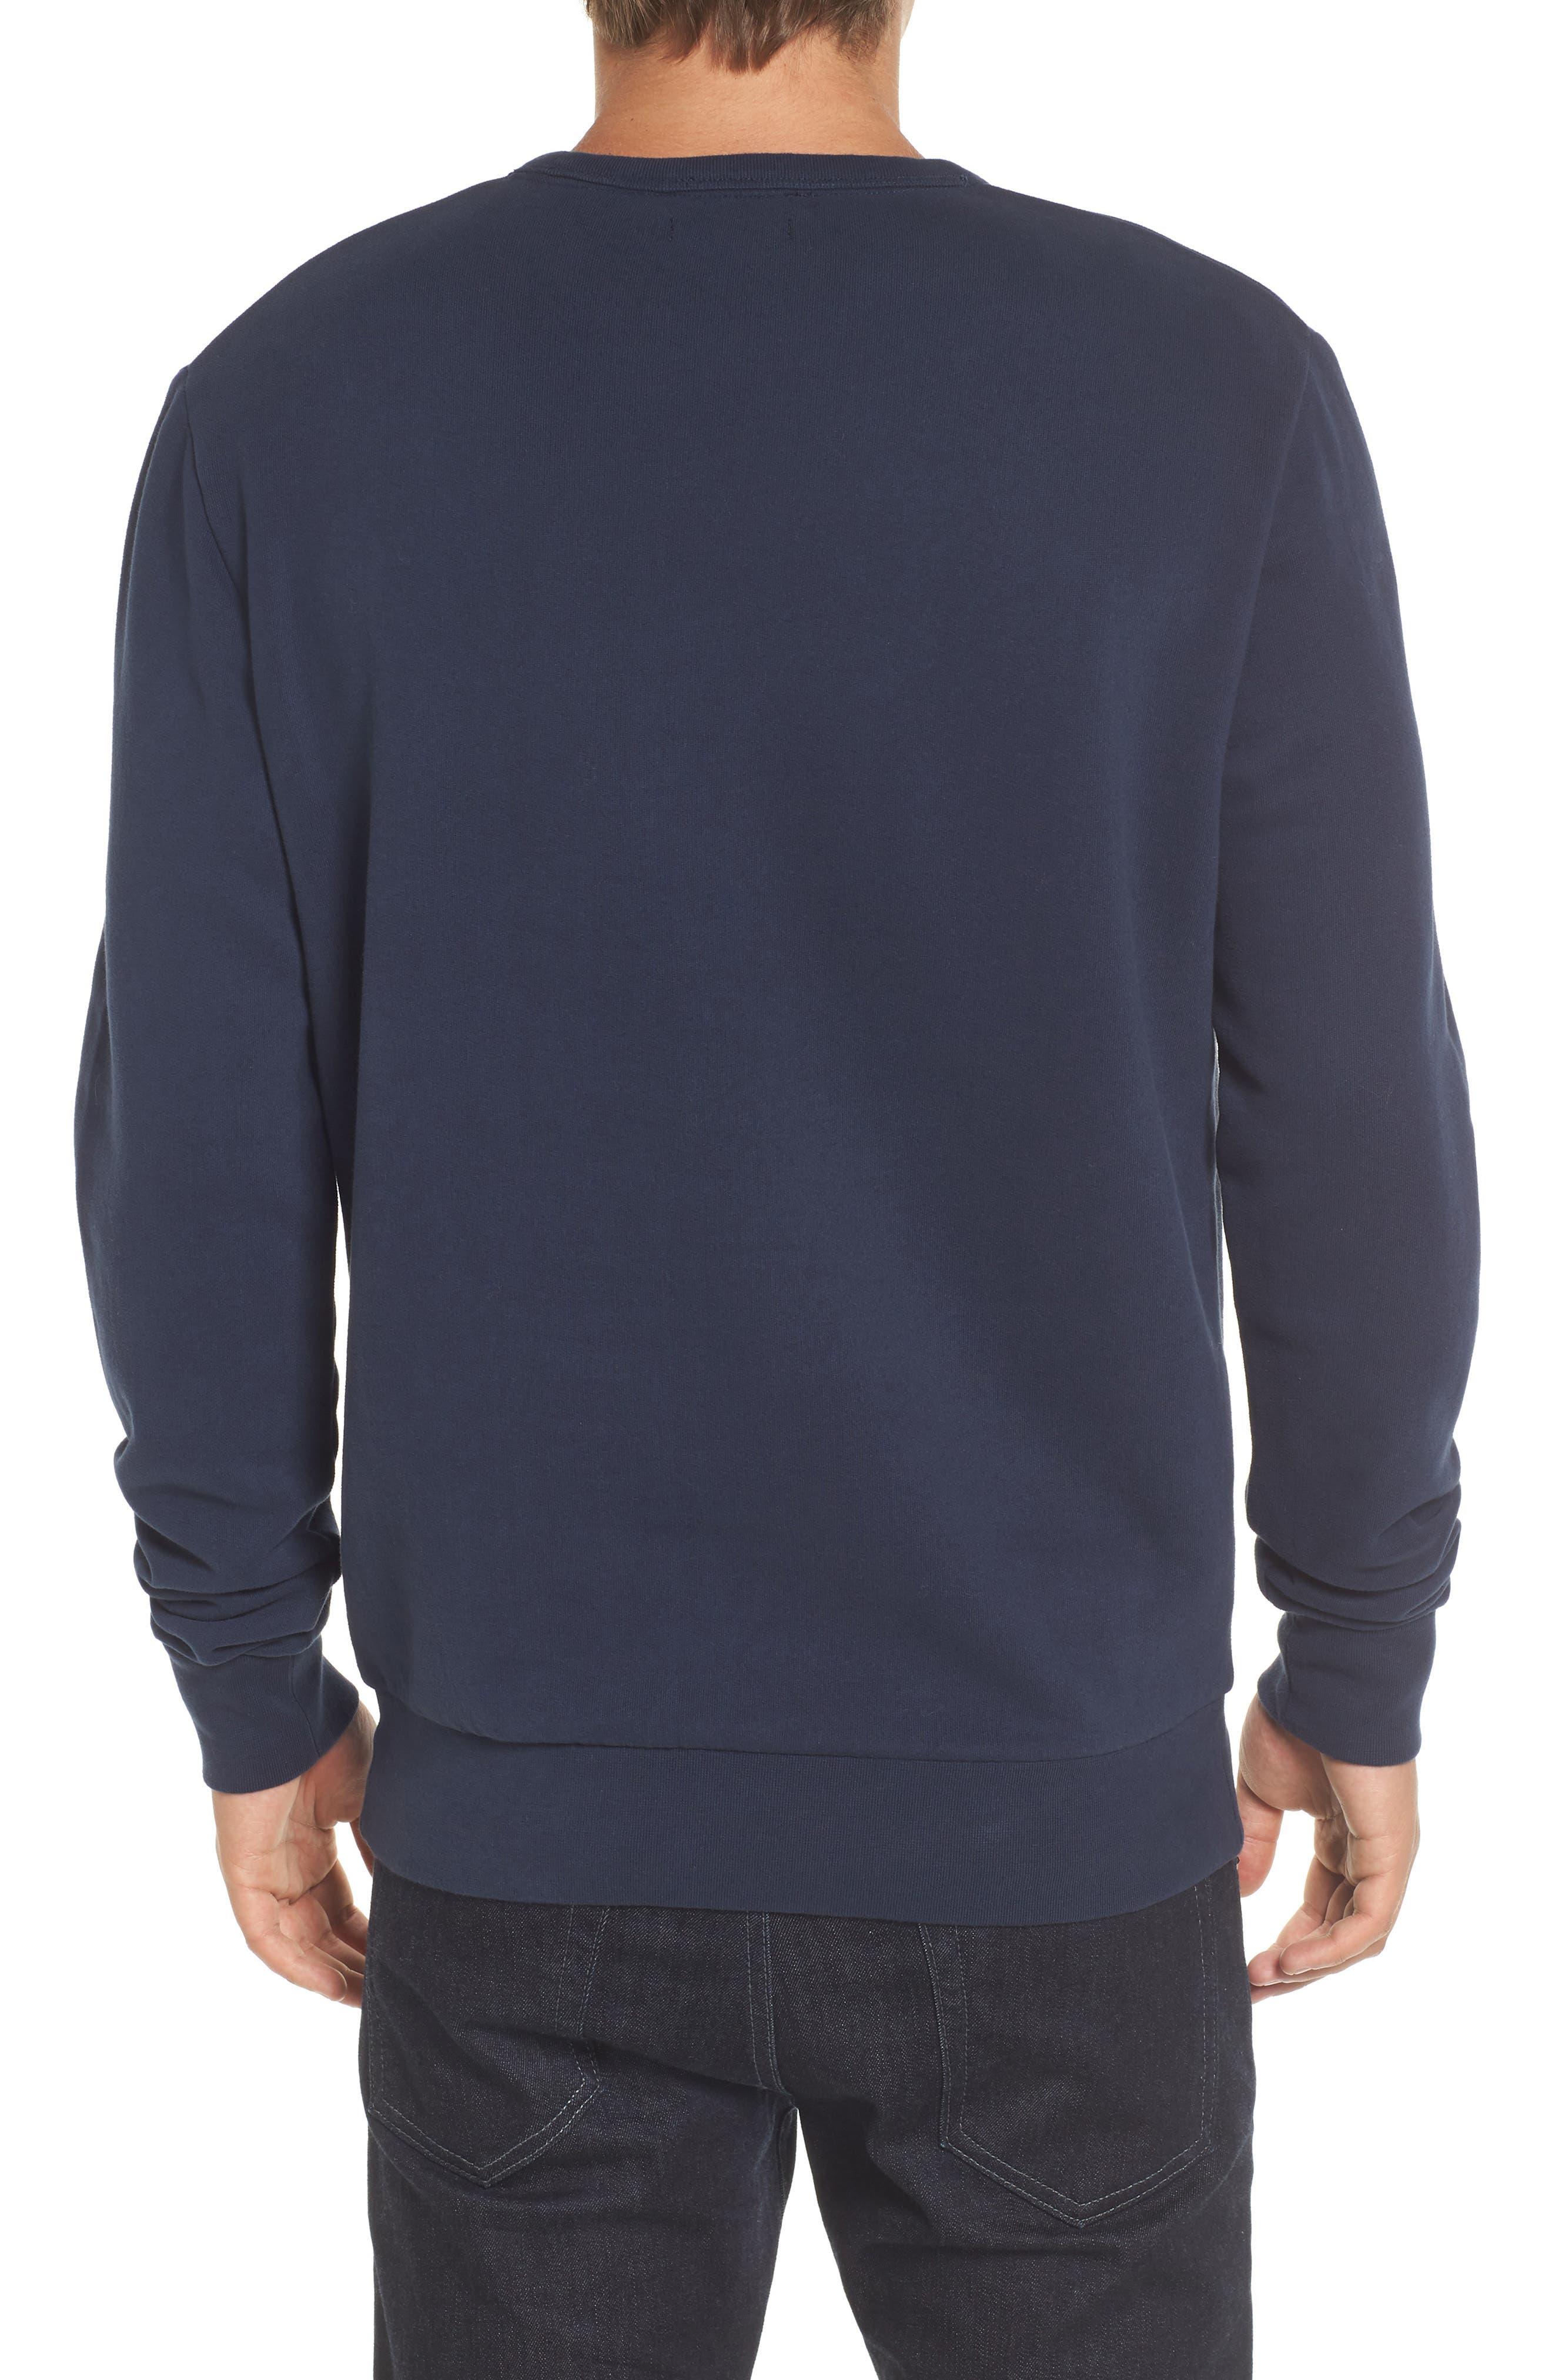 Salut Crewneck Sweater,                             Alternate thumbnail 2, color,                             408